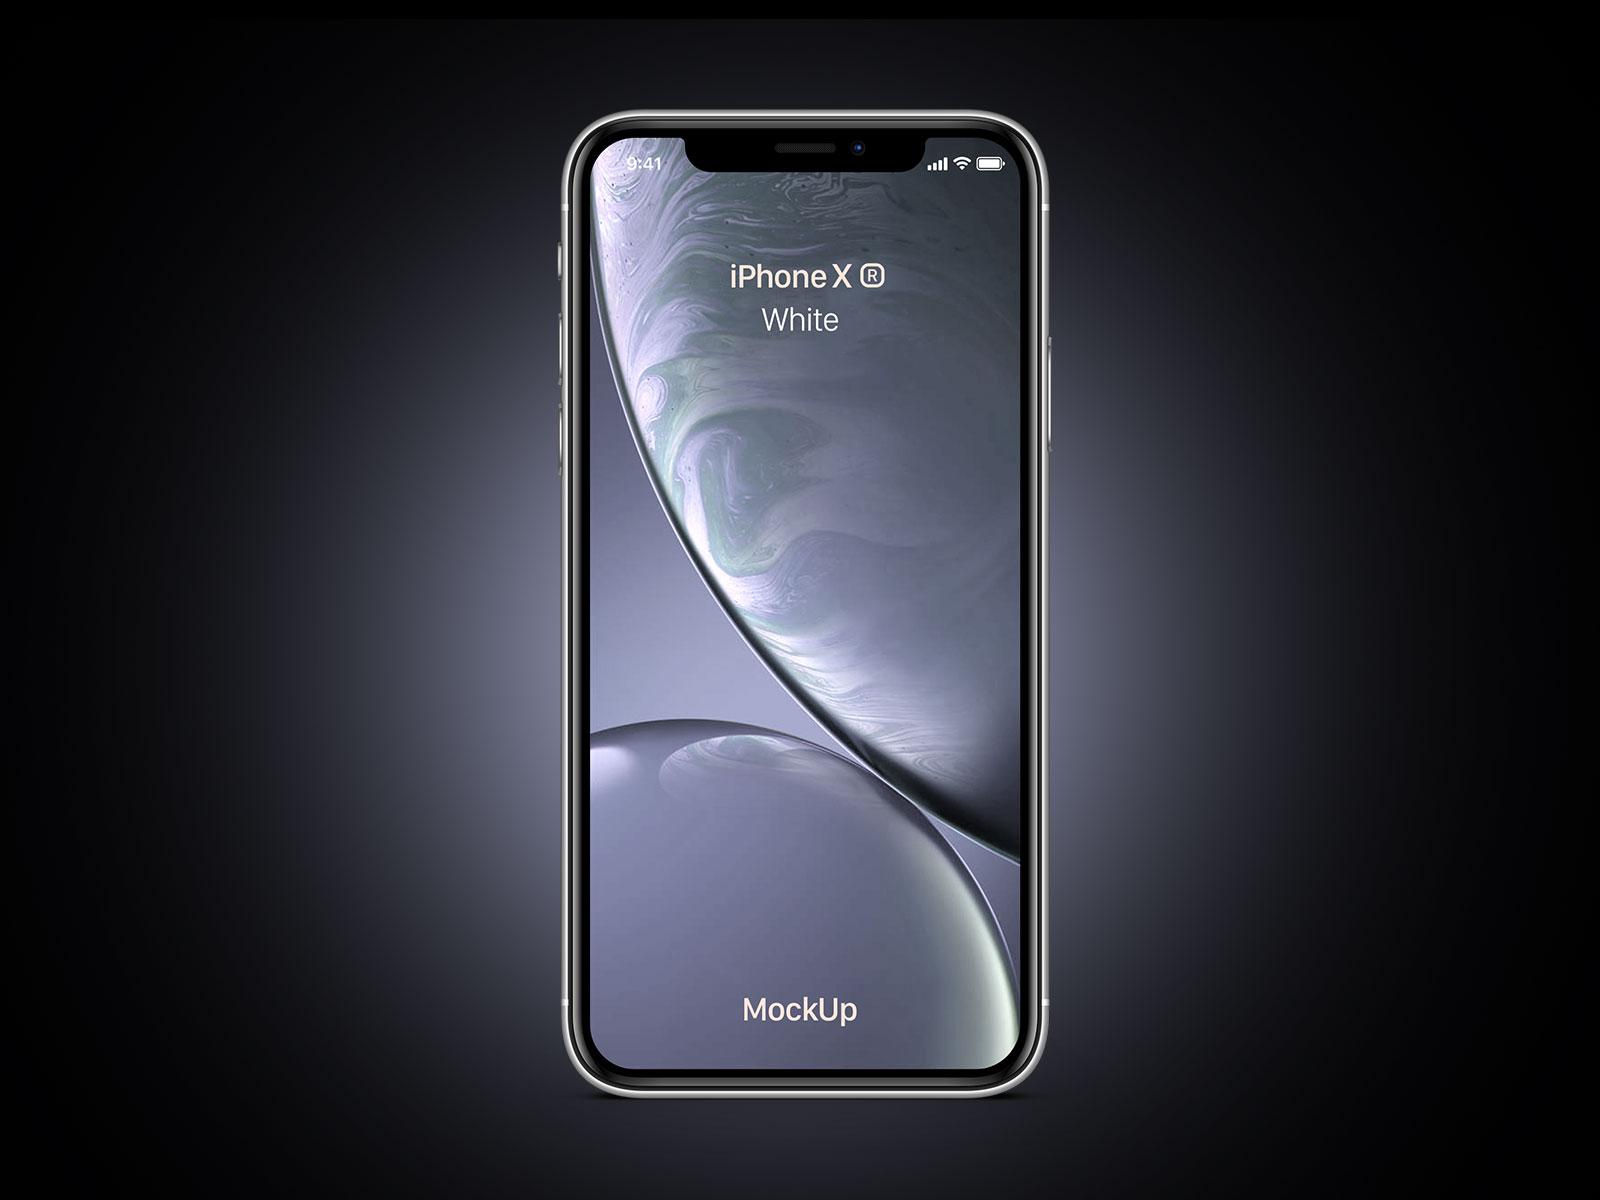 Free-iPhone-Xr-White-Mockup-PSD